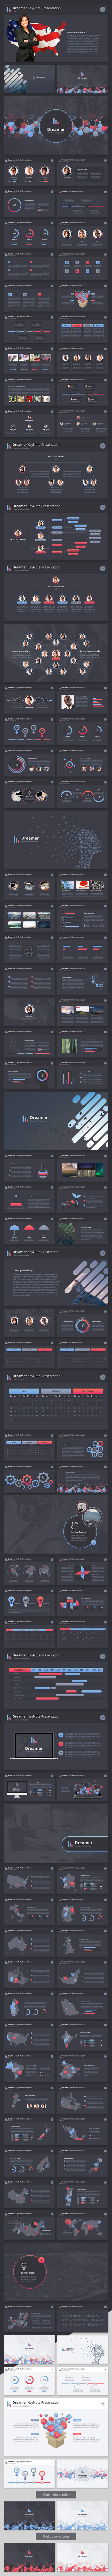 Dreamer KeyNote Template #design #slides Download: http://graphicriver.net/item/dreamer-keynote/13865277?ref=ksioks